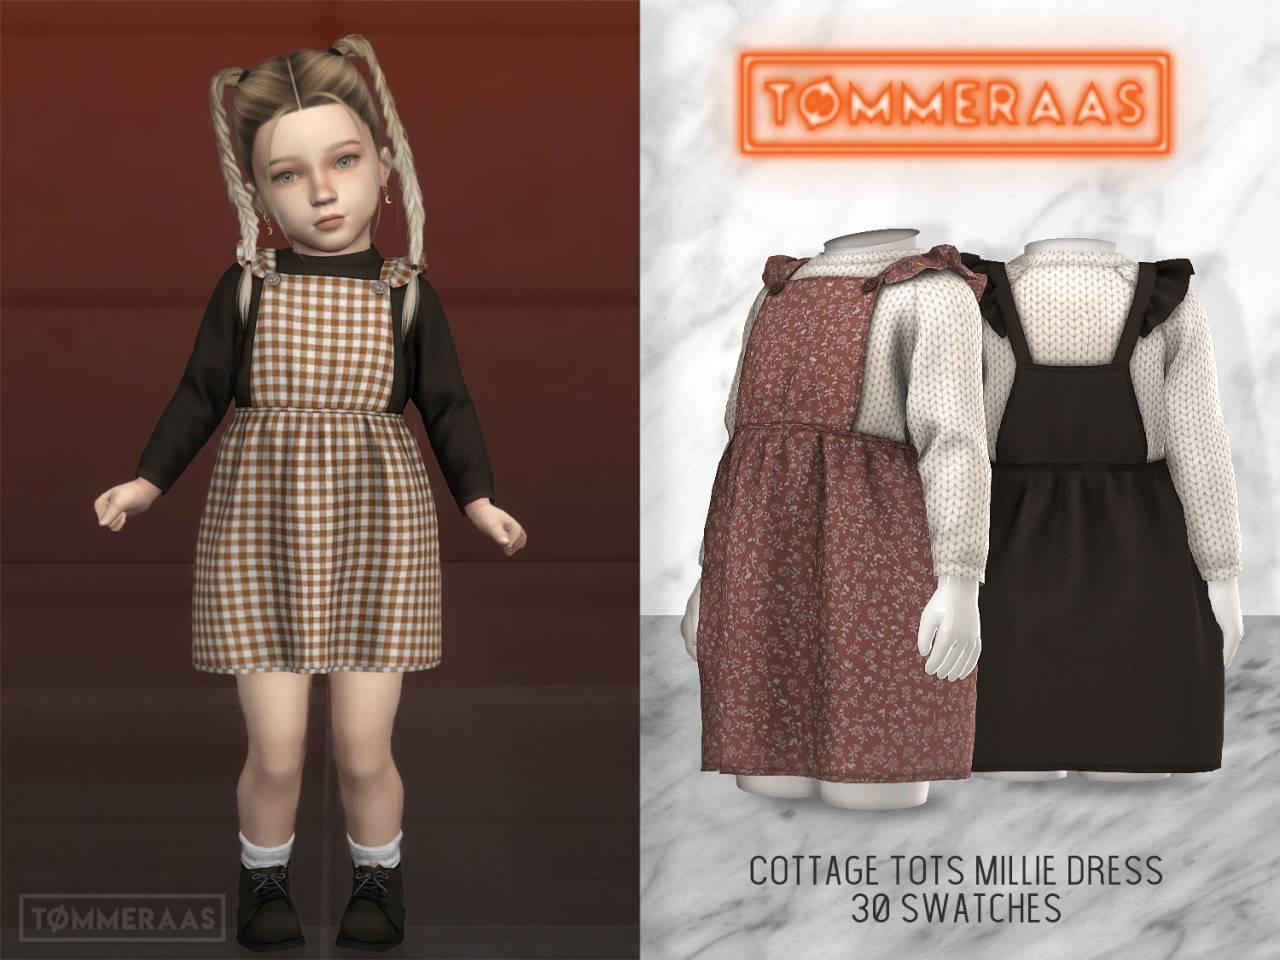 Сарафан и свитер - Cottage Tots Millie Dress